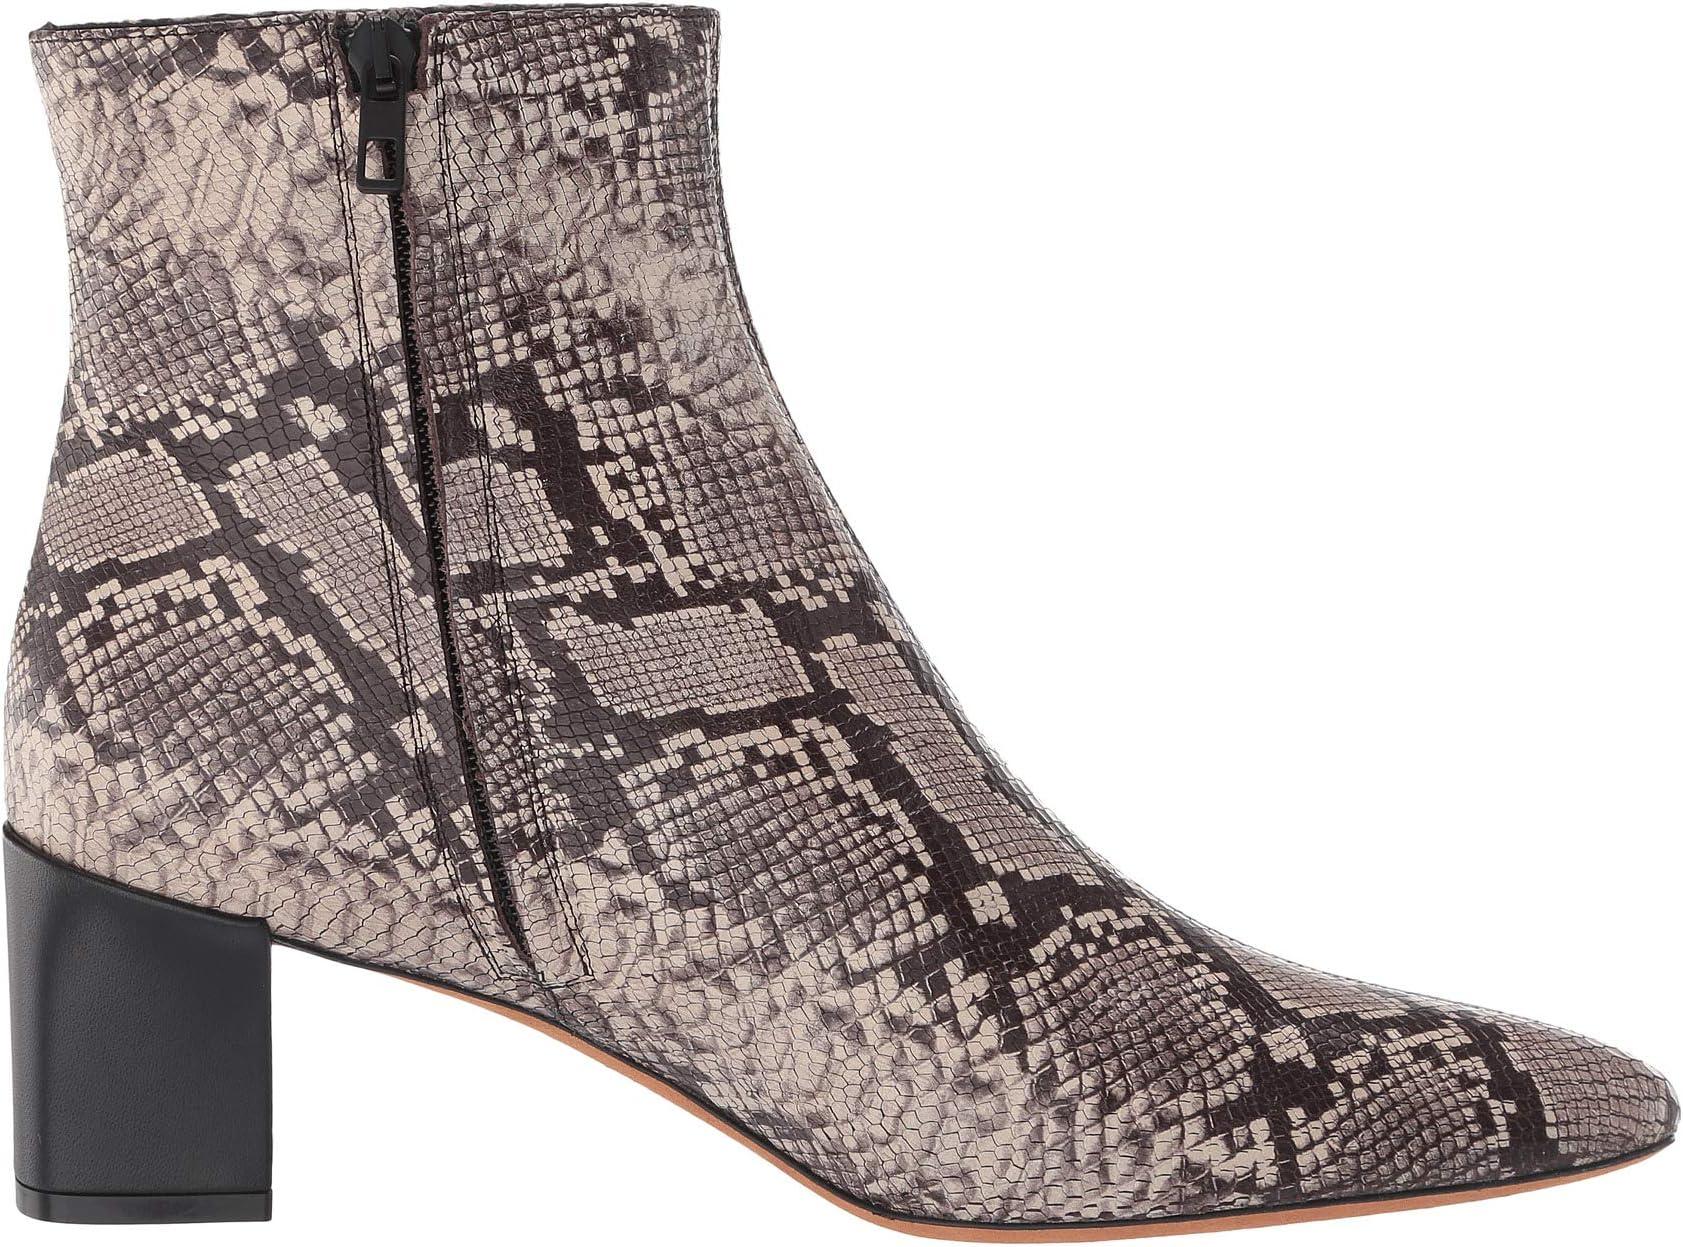 Vince Lanica | Women's shoes | 2020 Newest